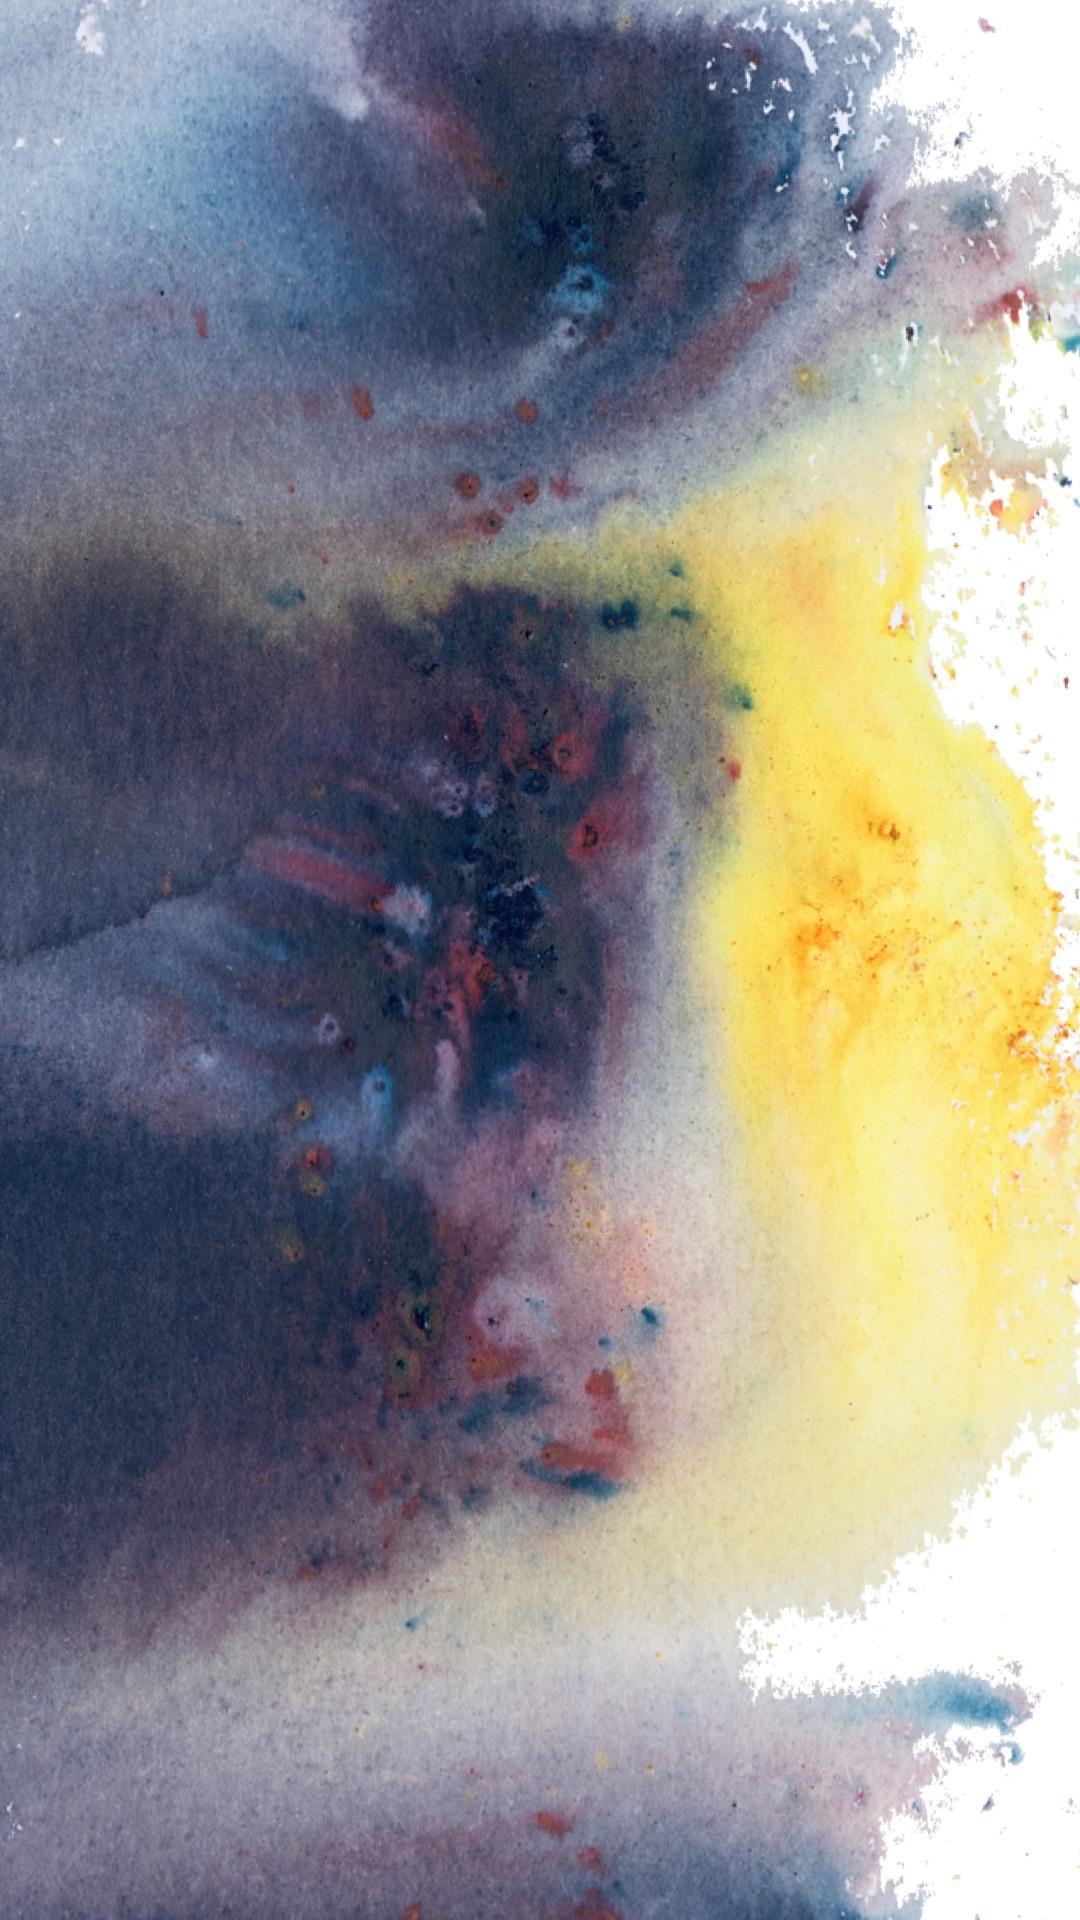 Watercolor Phone Wallpaper - Royal Treatment